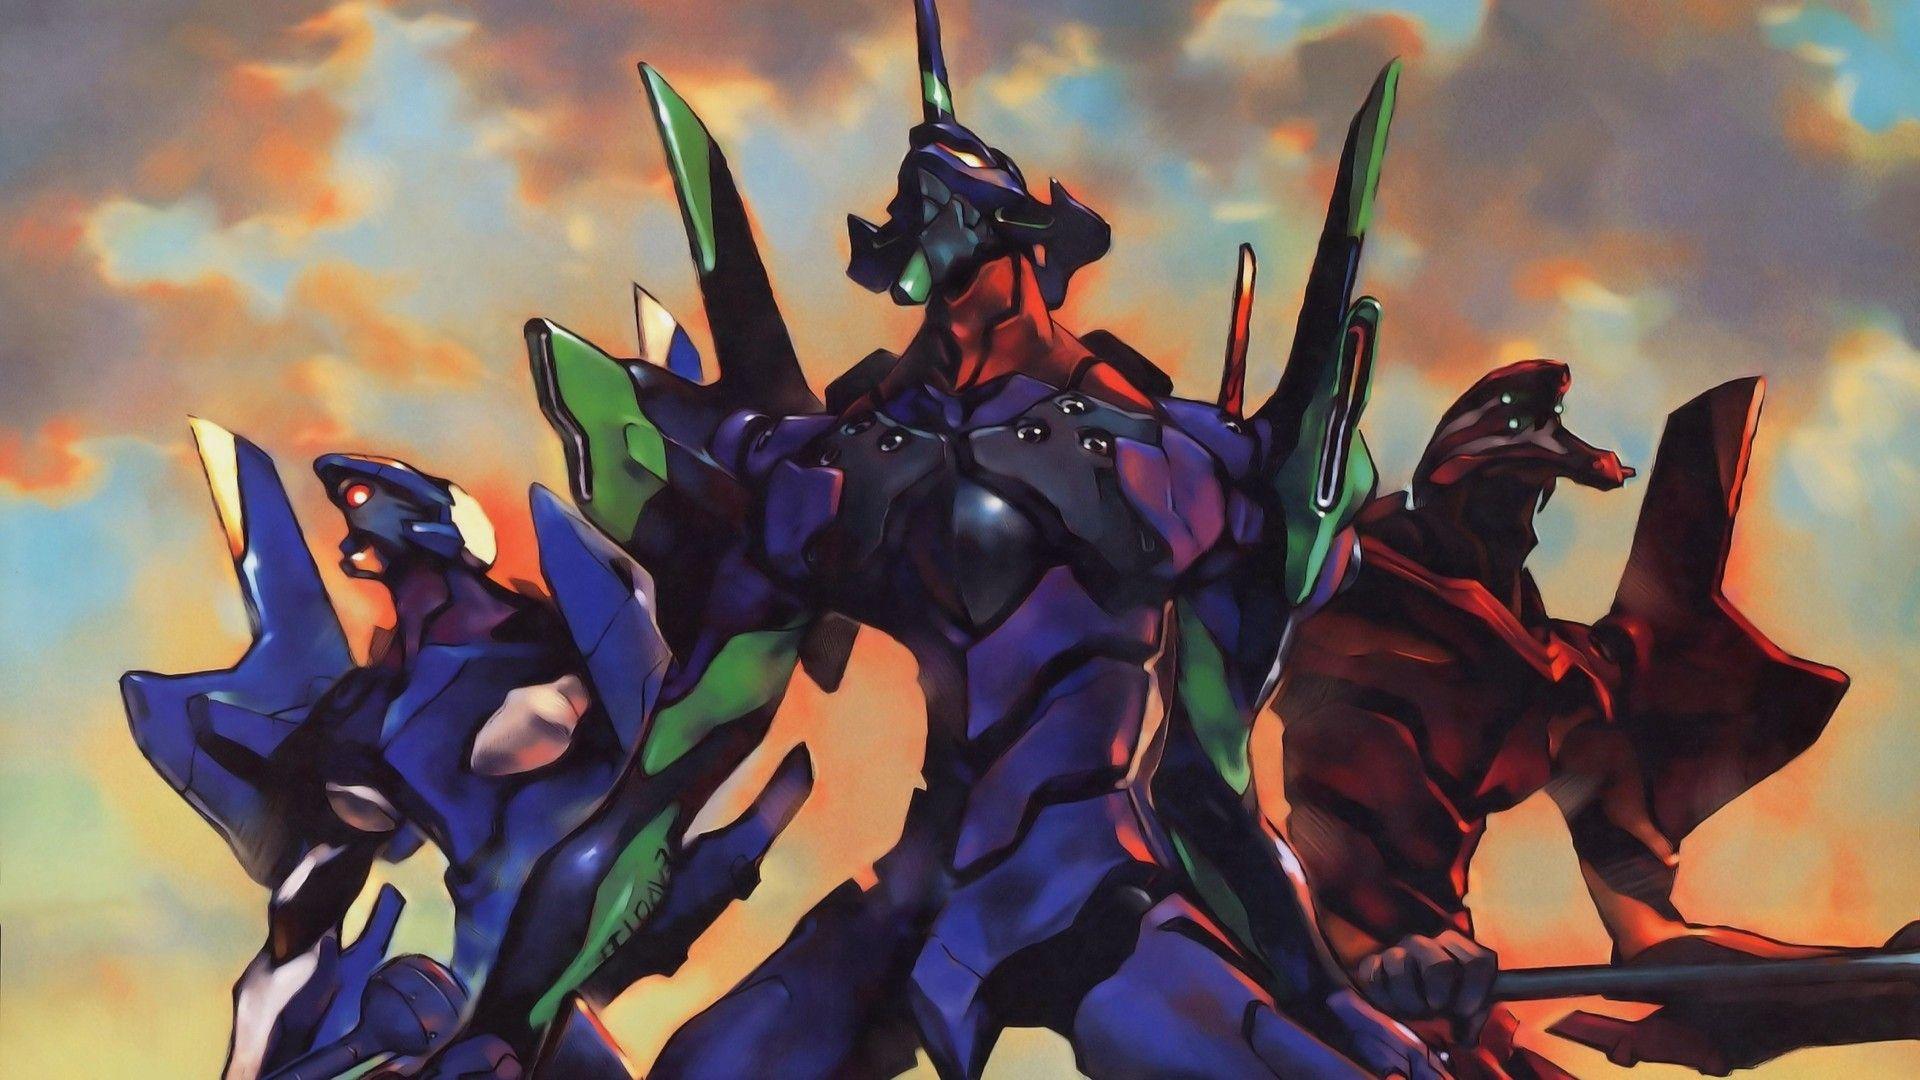 neon genesis evangelion wallpapers hd | bioshock infinite